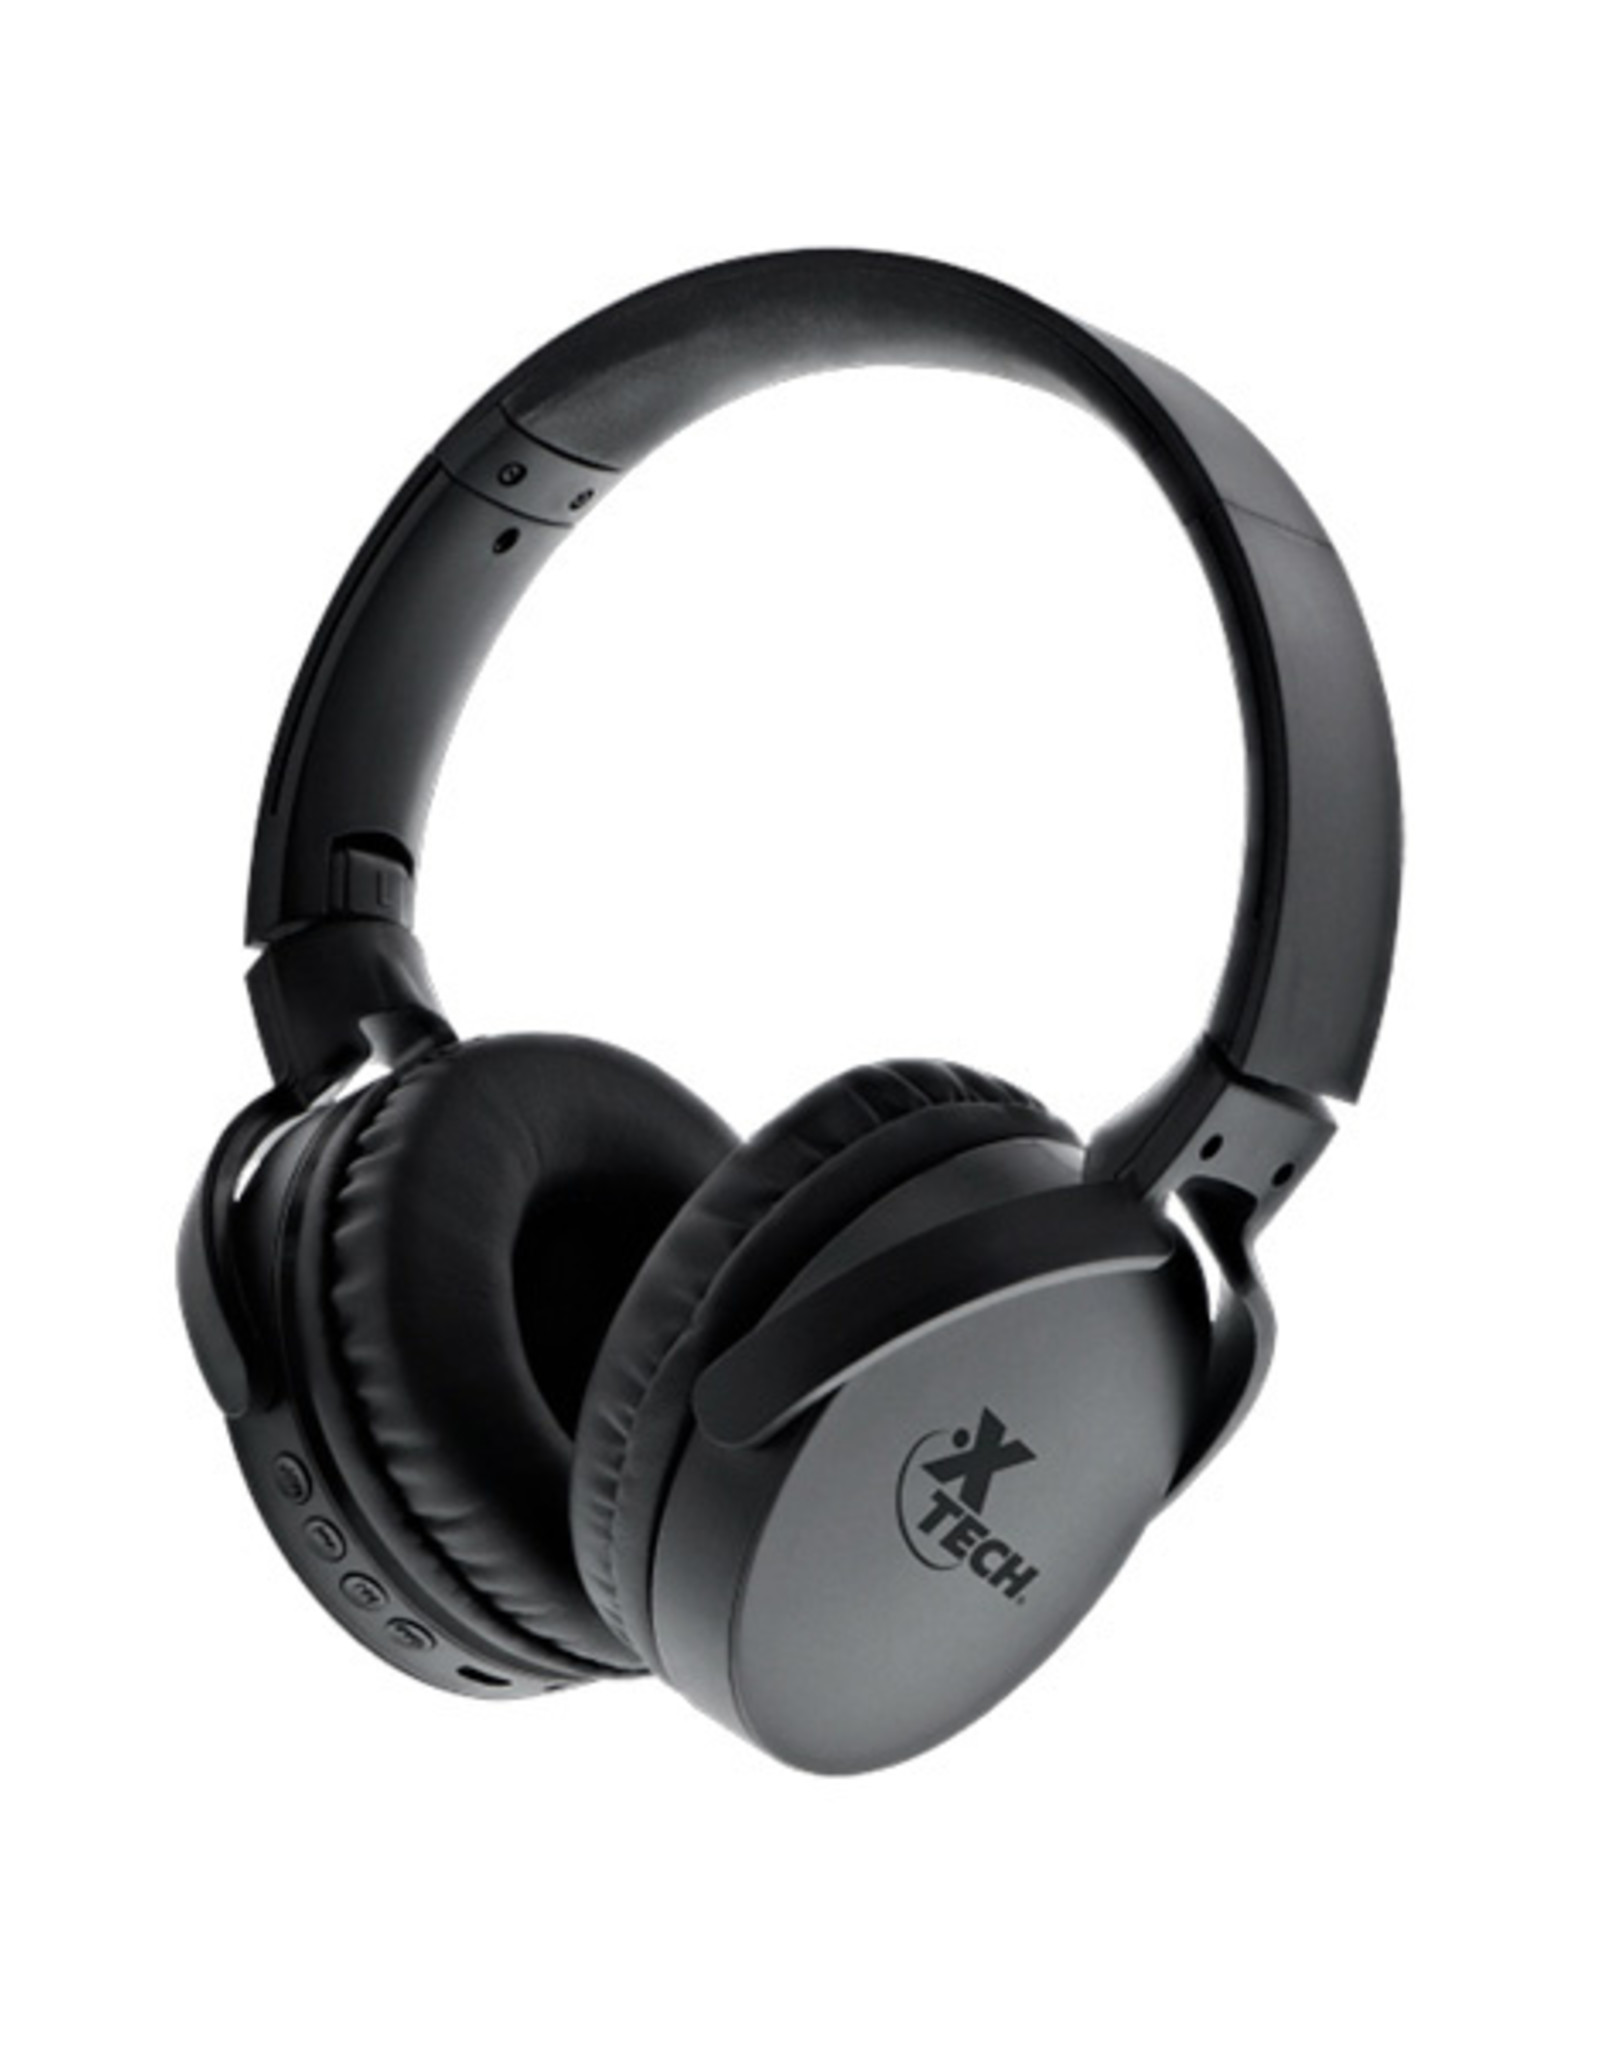 Xtech Wireless Bluetooth Headphones